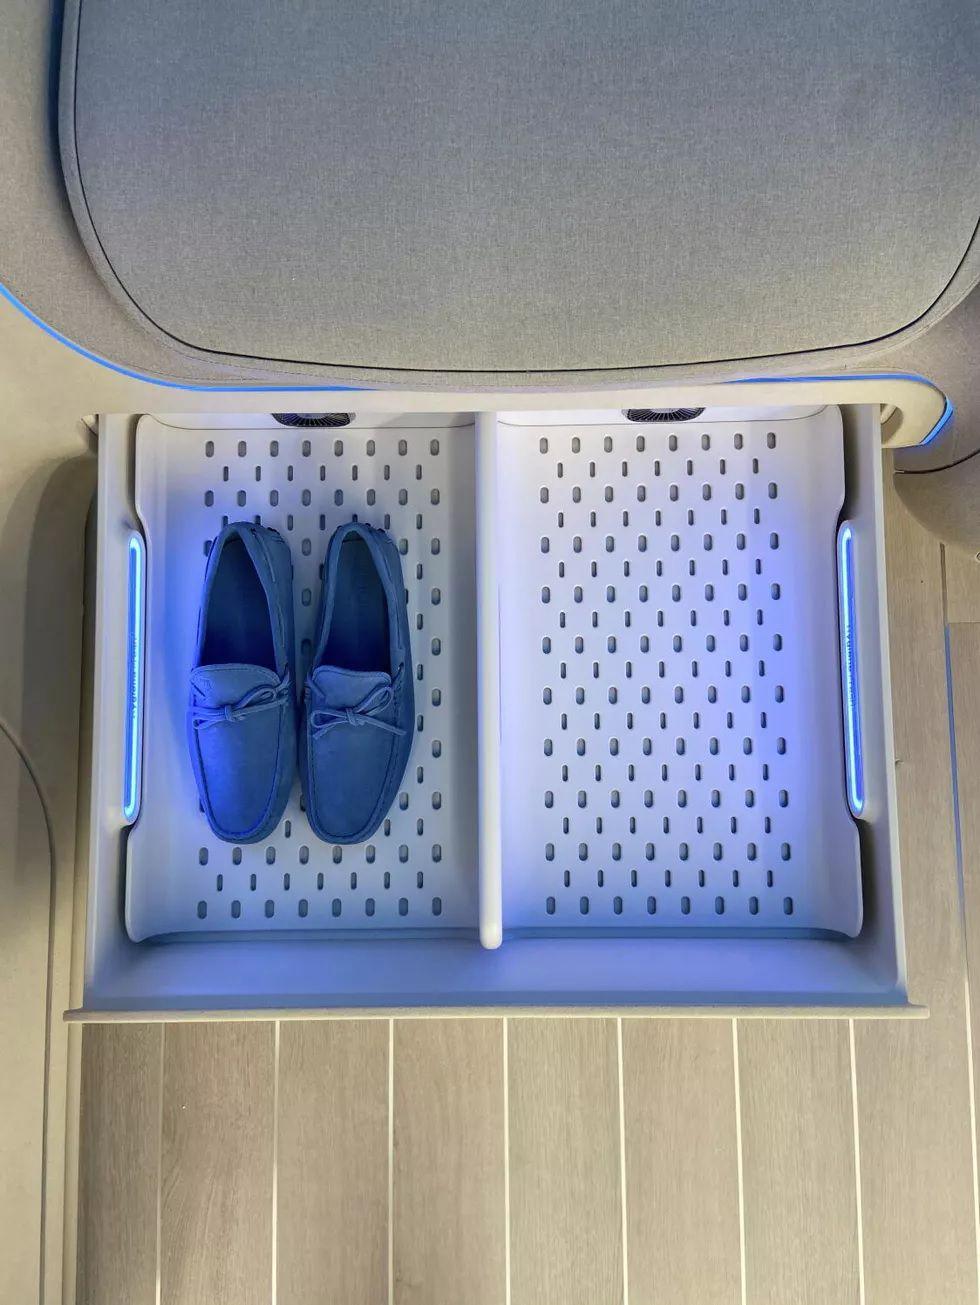 LG Hyundai EVs Cabin 2 طرح مفهومی هیوندای و ال جی برای کابین خودروهای برقی: ربات و تلویزیون غول پیکر اخبار IT